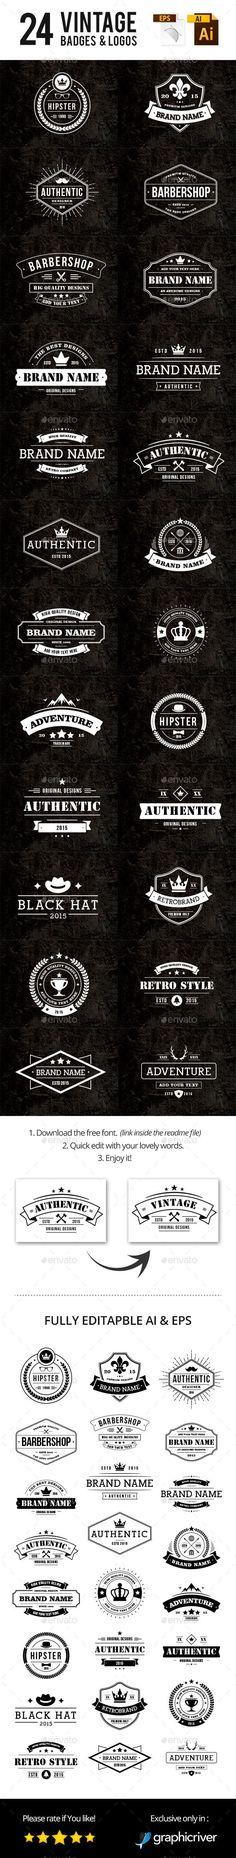 Typography - Typography - 24 Vintage Badges & Logos #design Download: graphicriver.net/...... Typography design & inspiration  Preview – Work    Description  24 Vintage Badges & Logos #design Download: graphicriver.net/…  – Source –